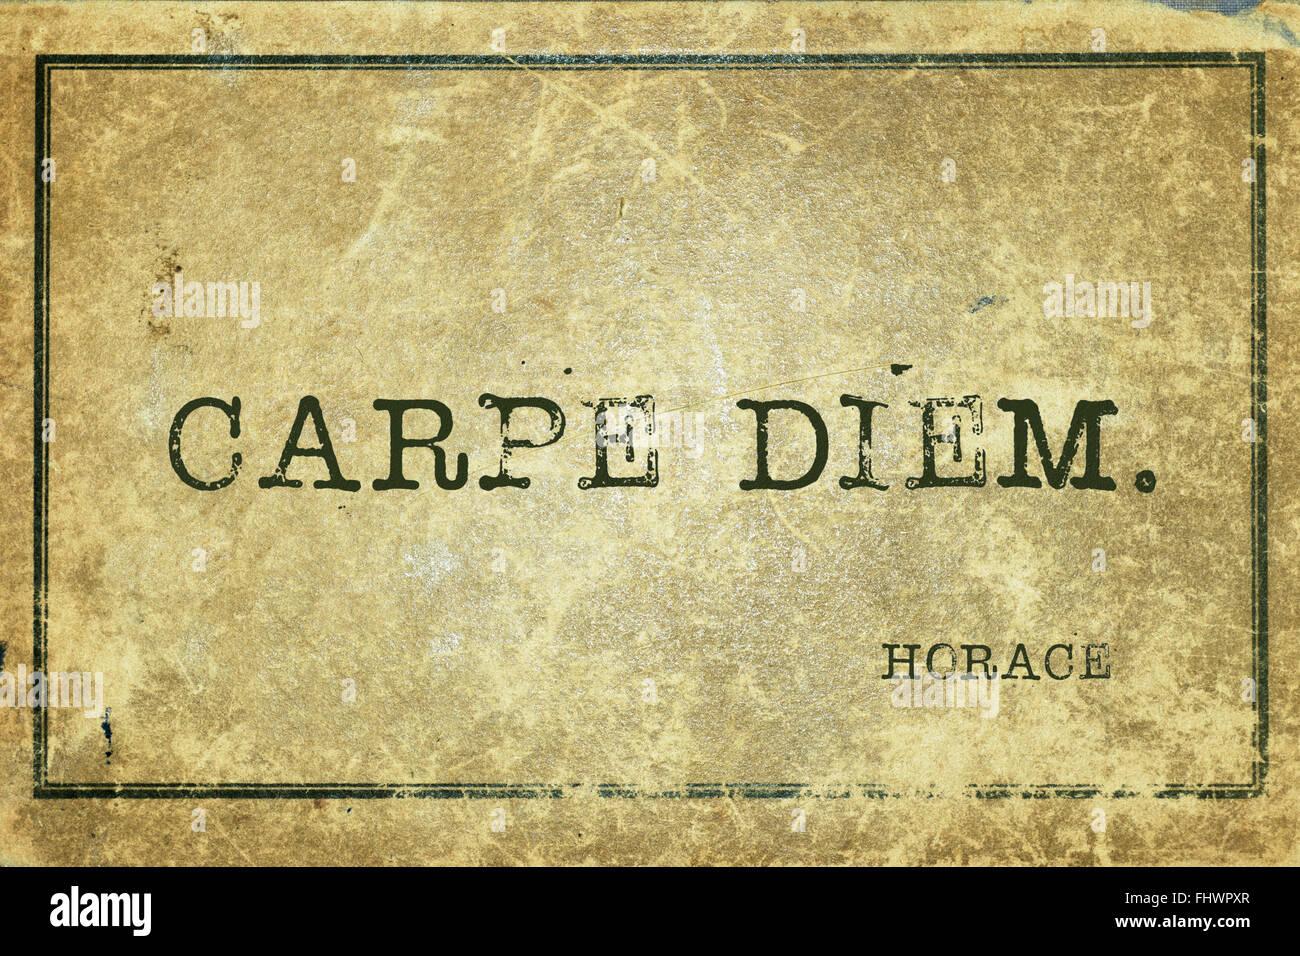 basic premises of carpe diem poetry